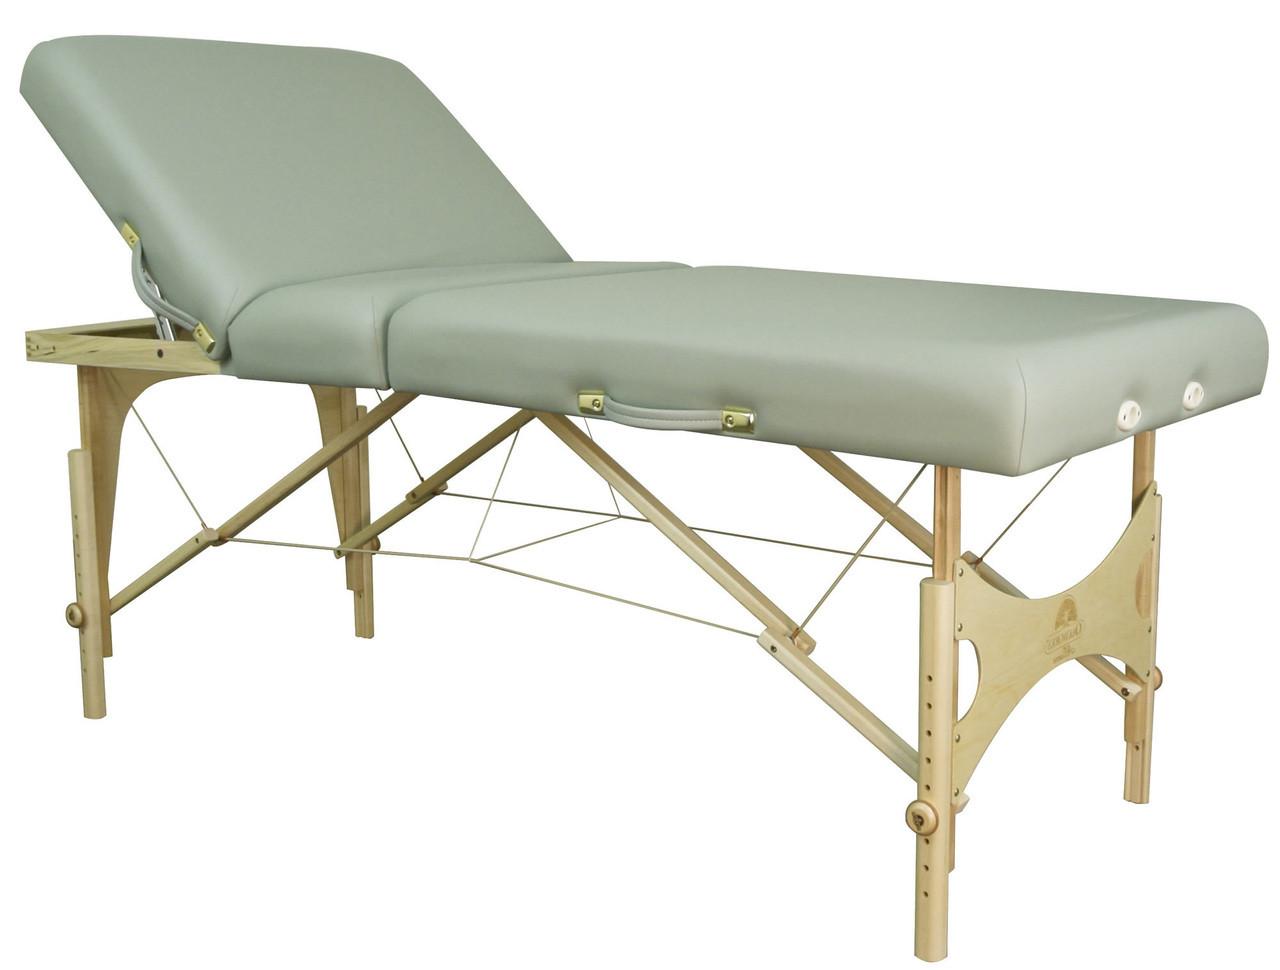 Oakworks Alliance Wooden Massage Table Liftback